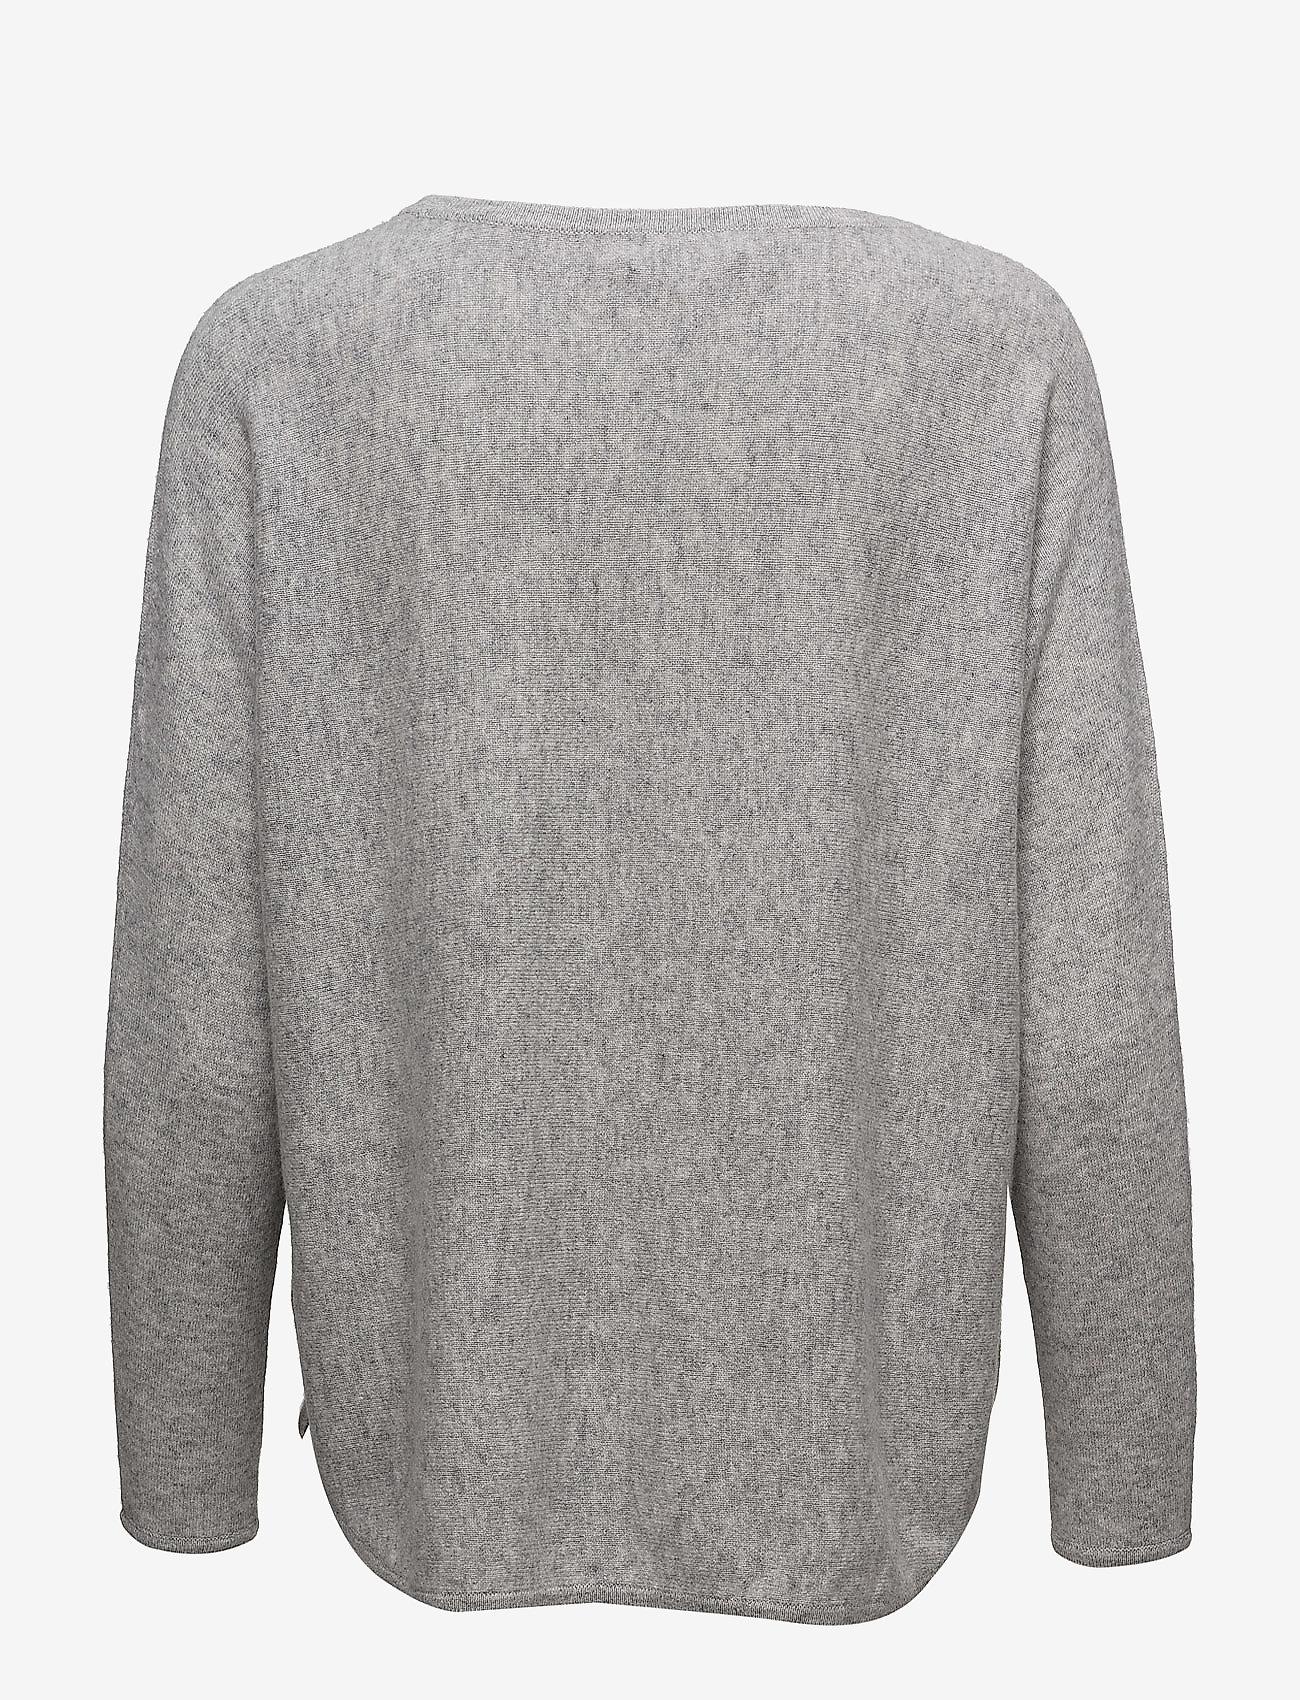 Curved Sweater  - Davida Cashmere